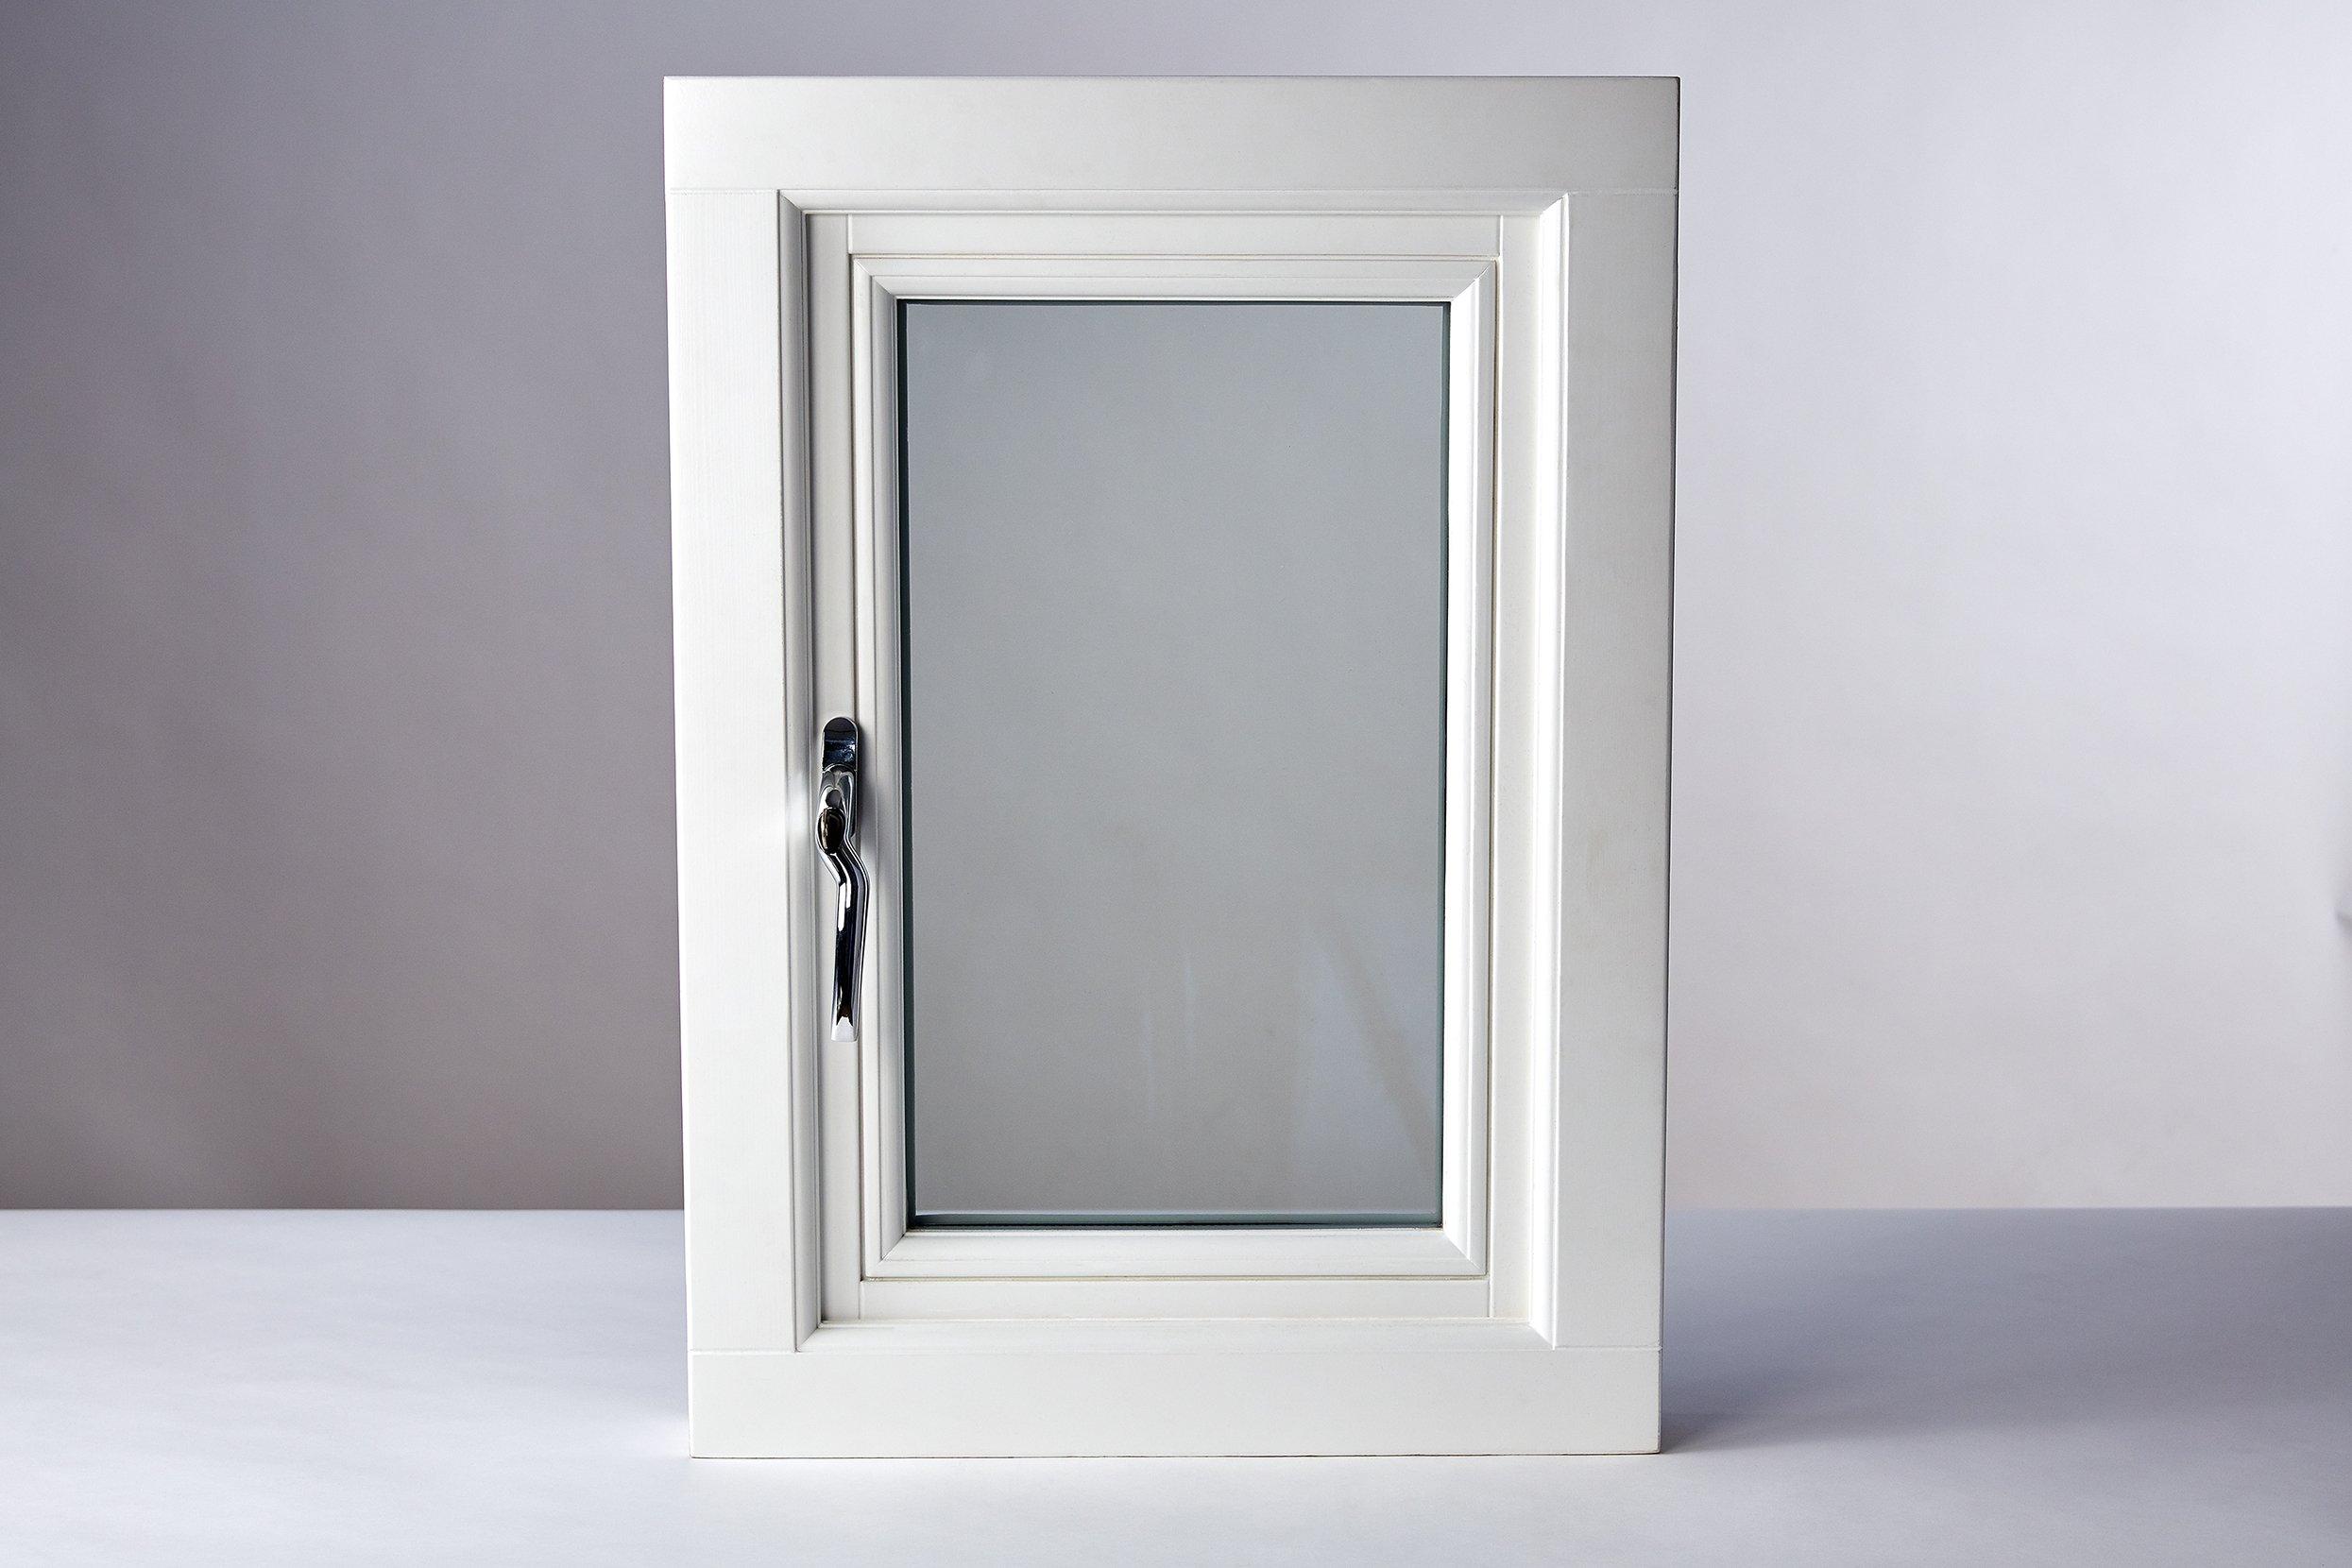 soundproof sash window closed